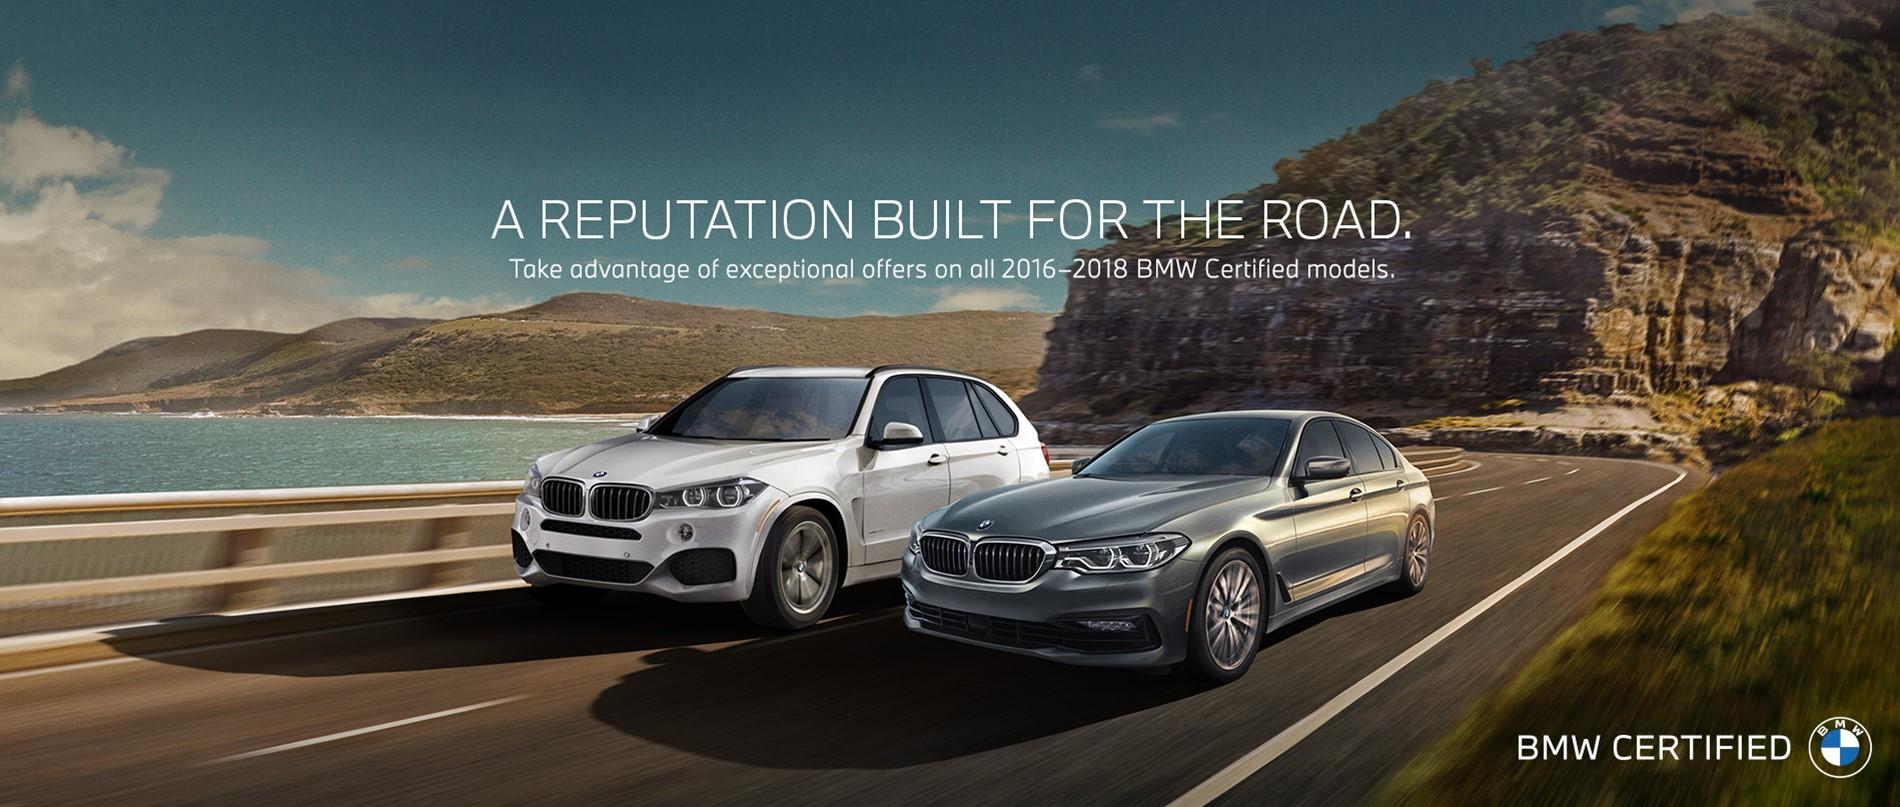 Used BMW, BMW Certified, Pre Owned BMW